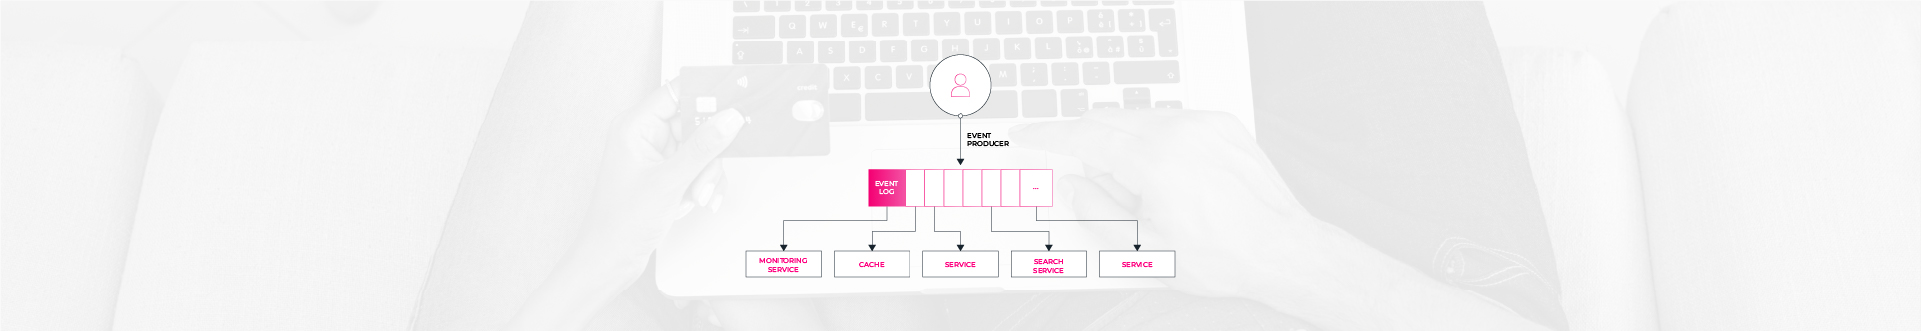 Event-sourcing_header